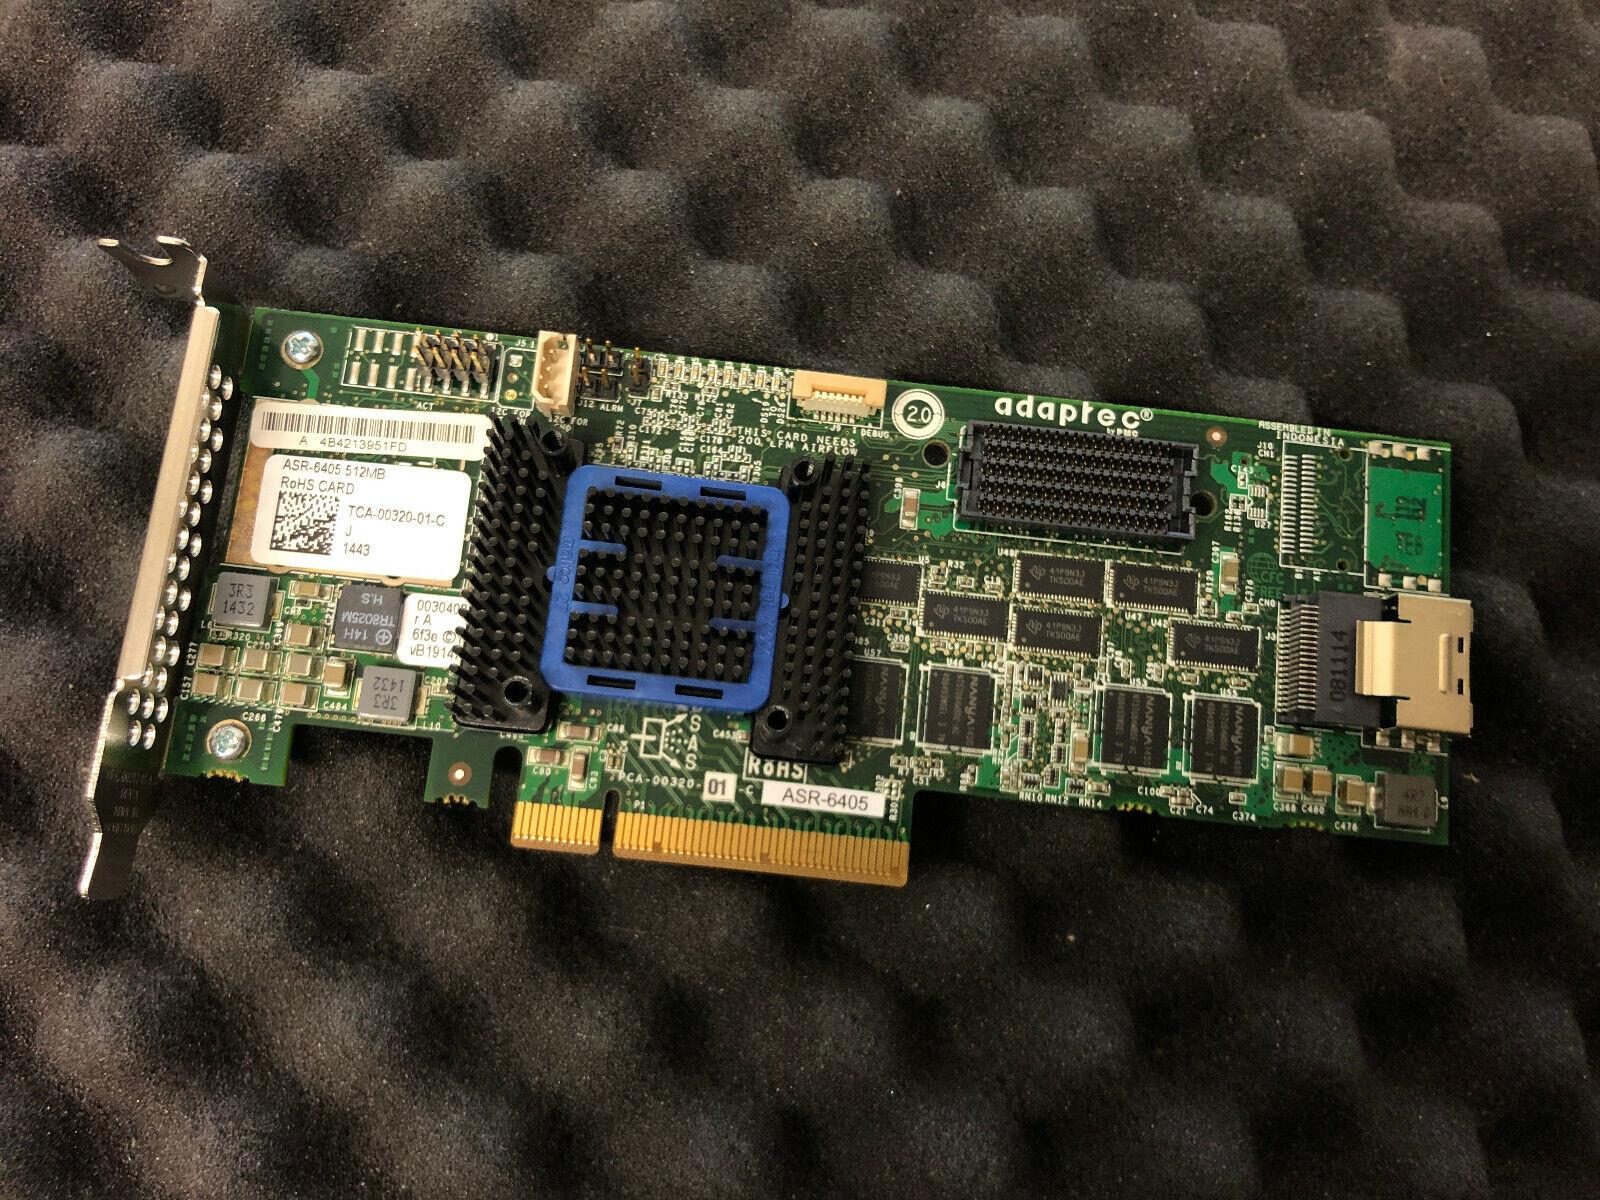 Adaptec RAID 6405 SAS/SATA 600 512MB PCIe x8 IMMEDIATE SHIPPING!!!